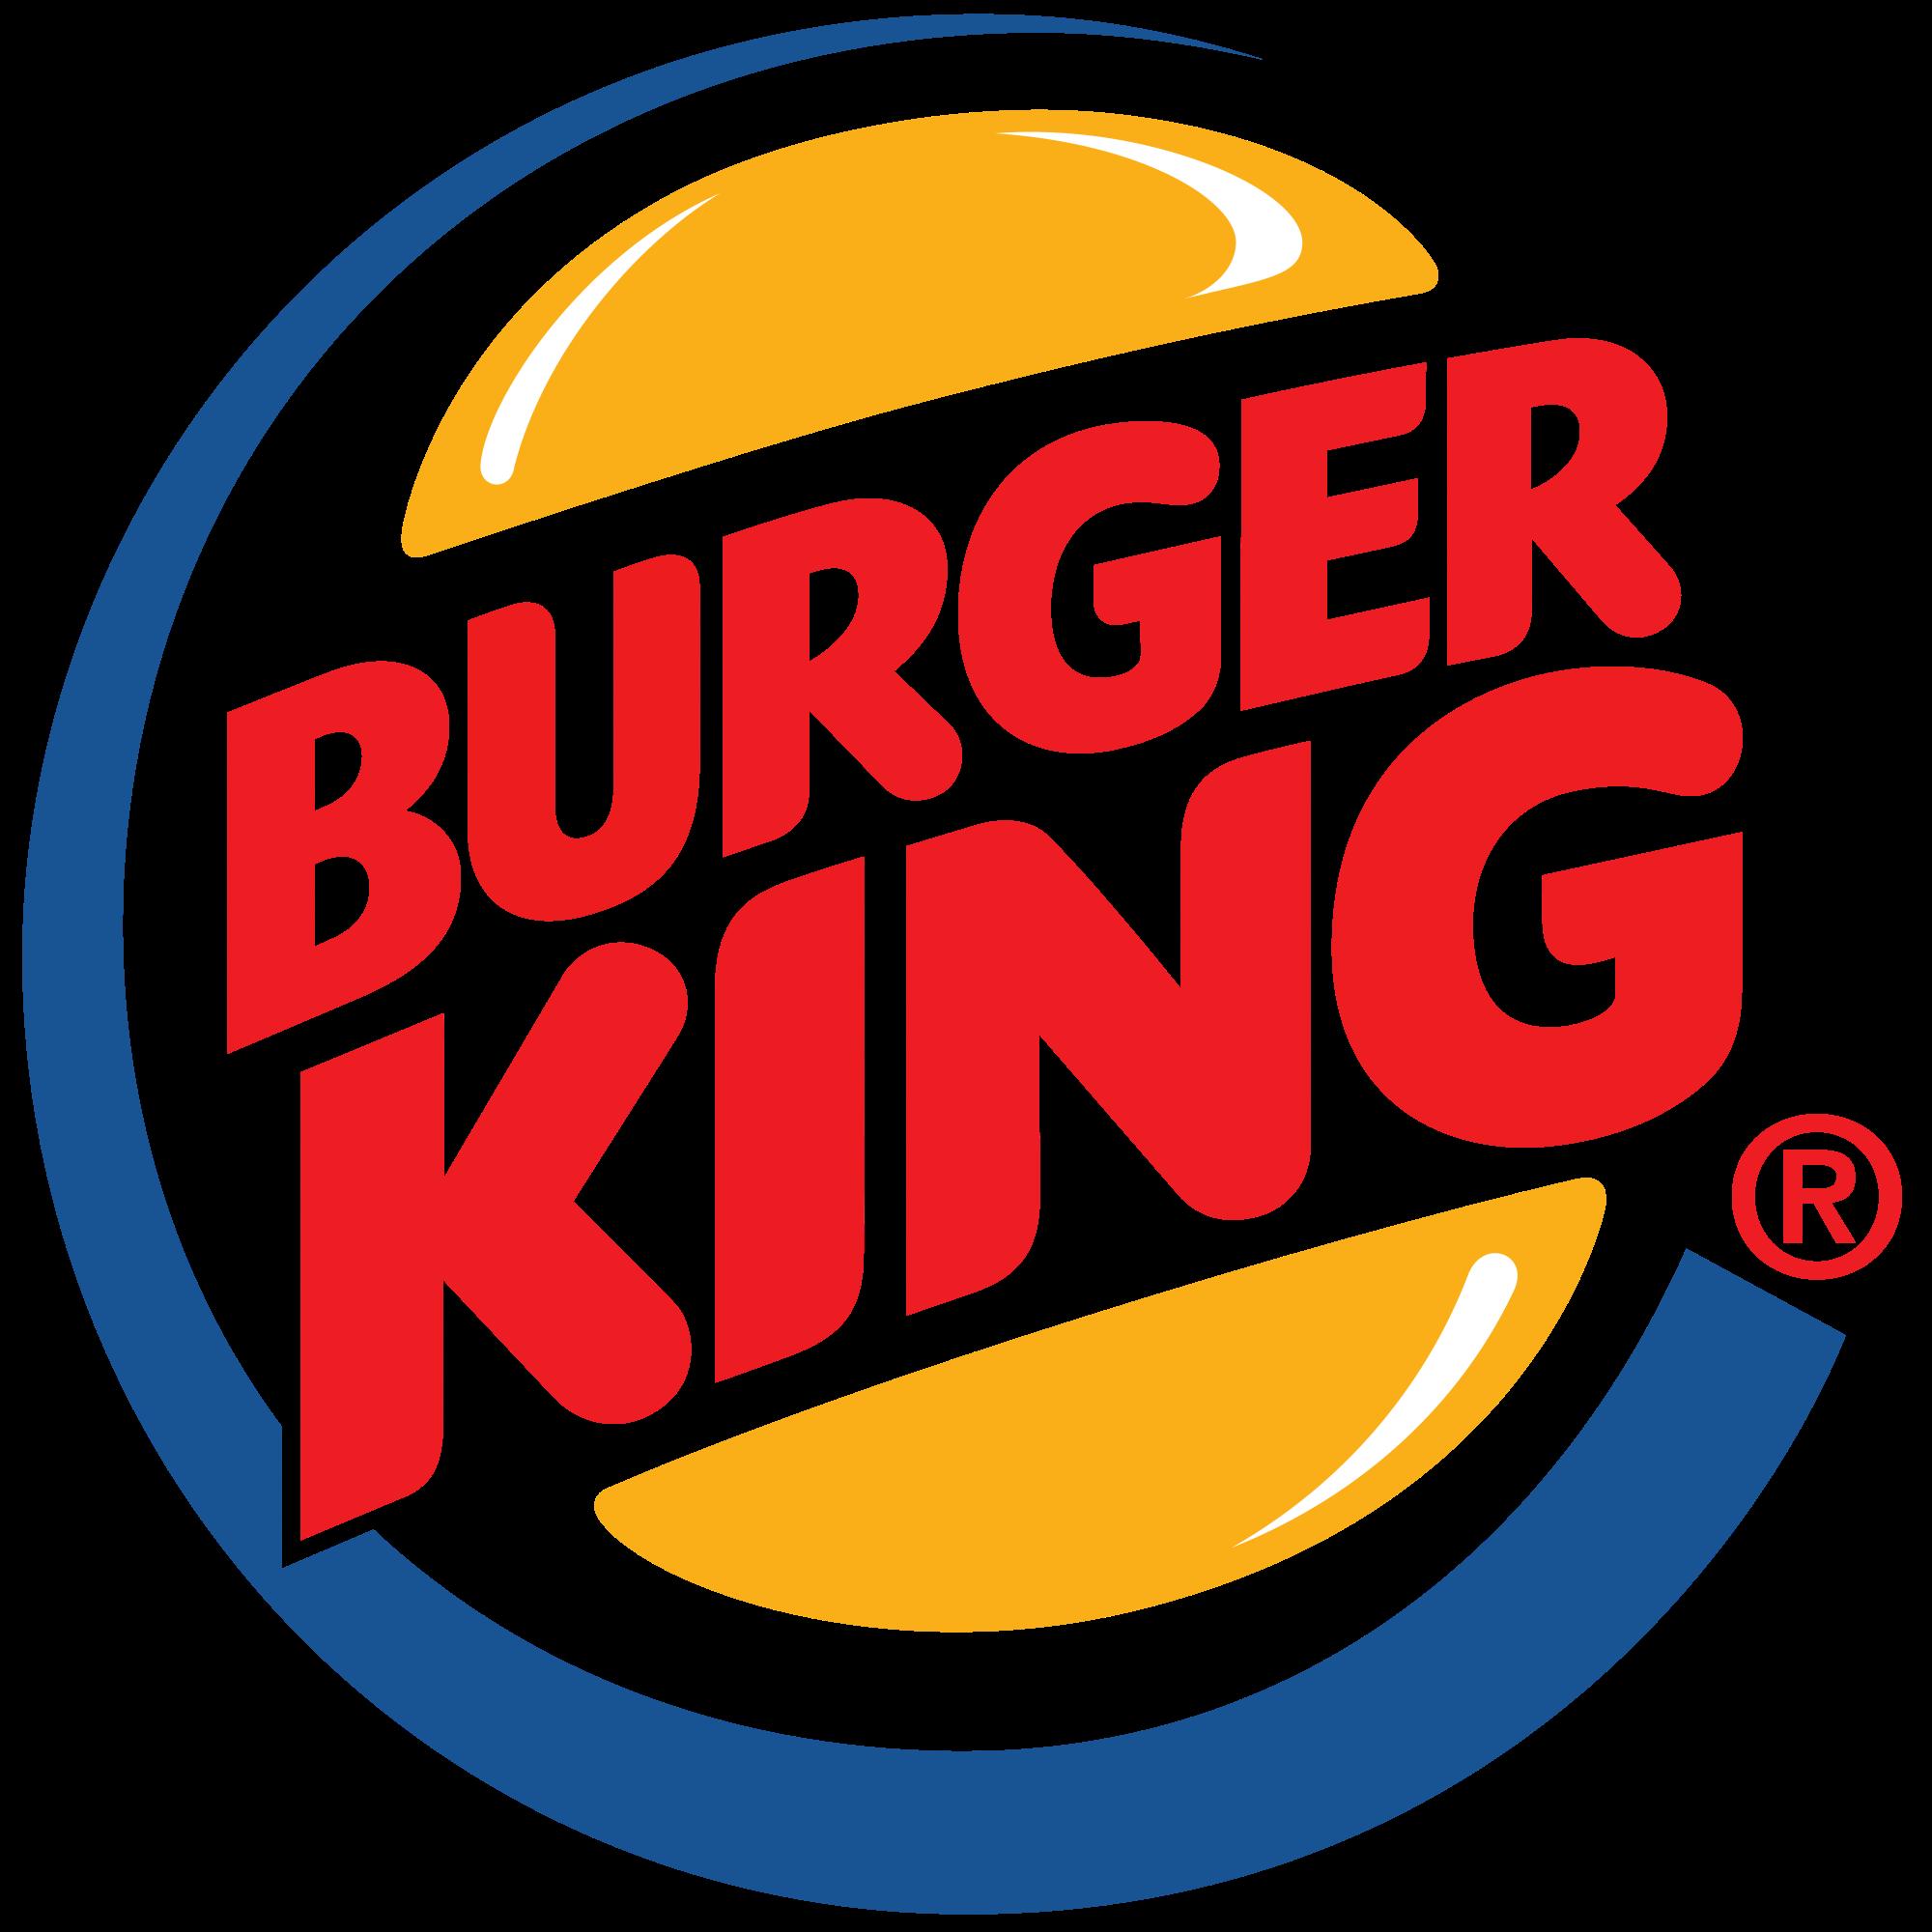 Burger King Format: PNG Image Resolution: 2000x2000. Size: 225 Kb - Burger King Logo PNG